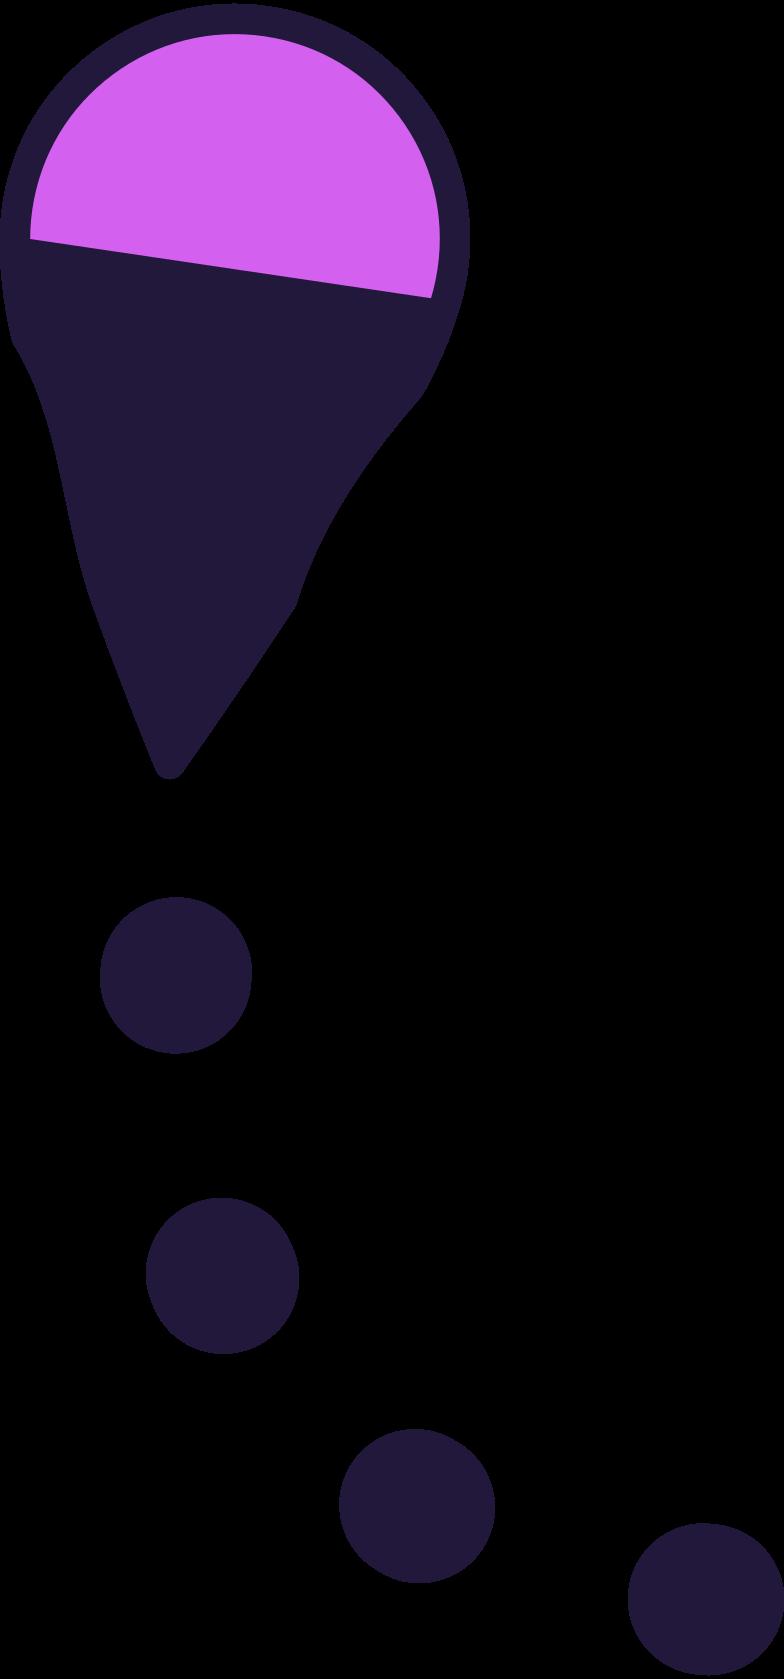 log in  hand Clipart illustration in PNG, SVG